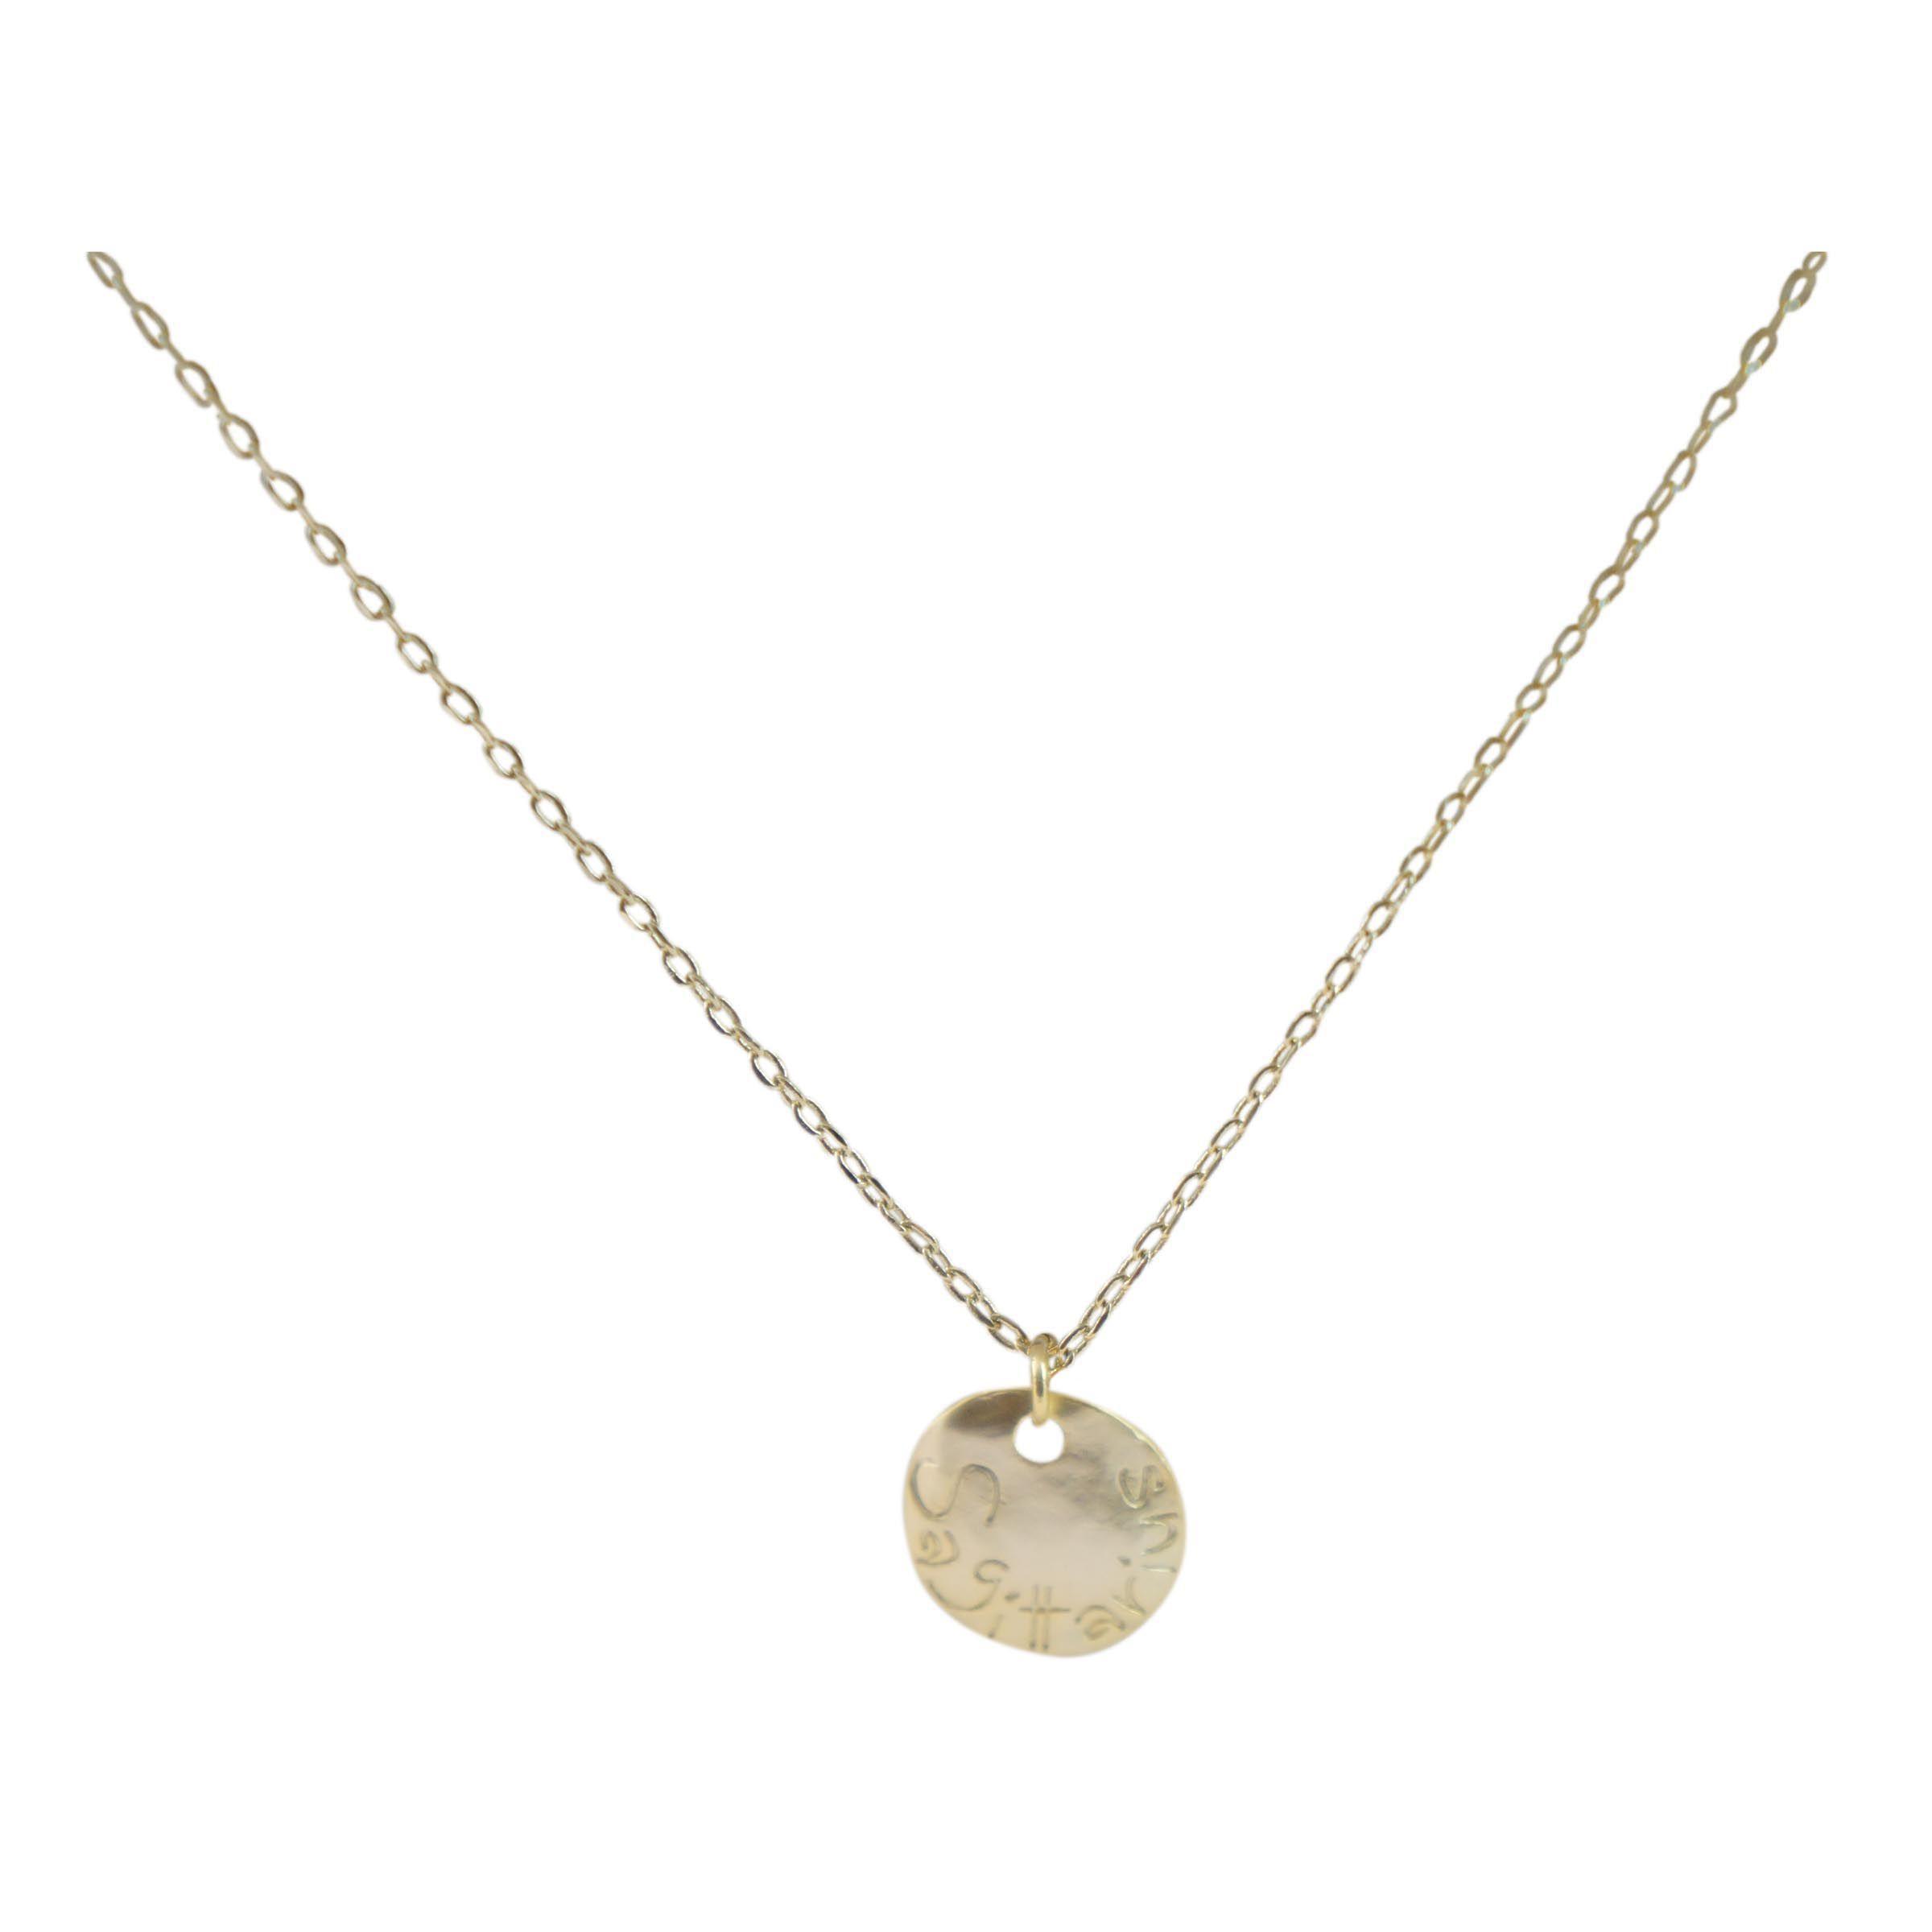 Ziba Layered Sagittarius Necklace in Metallic